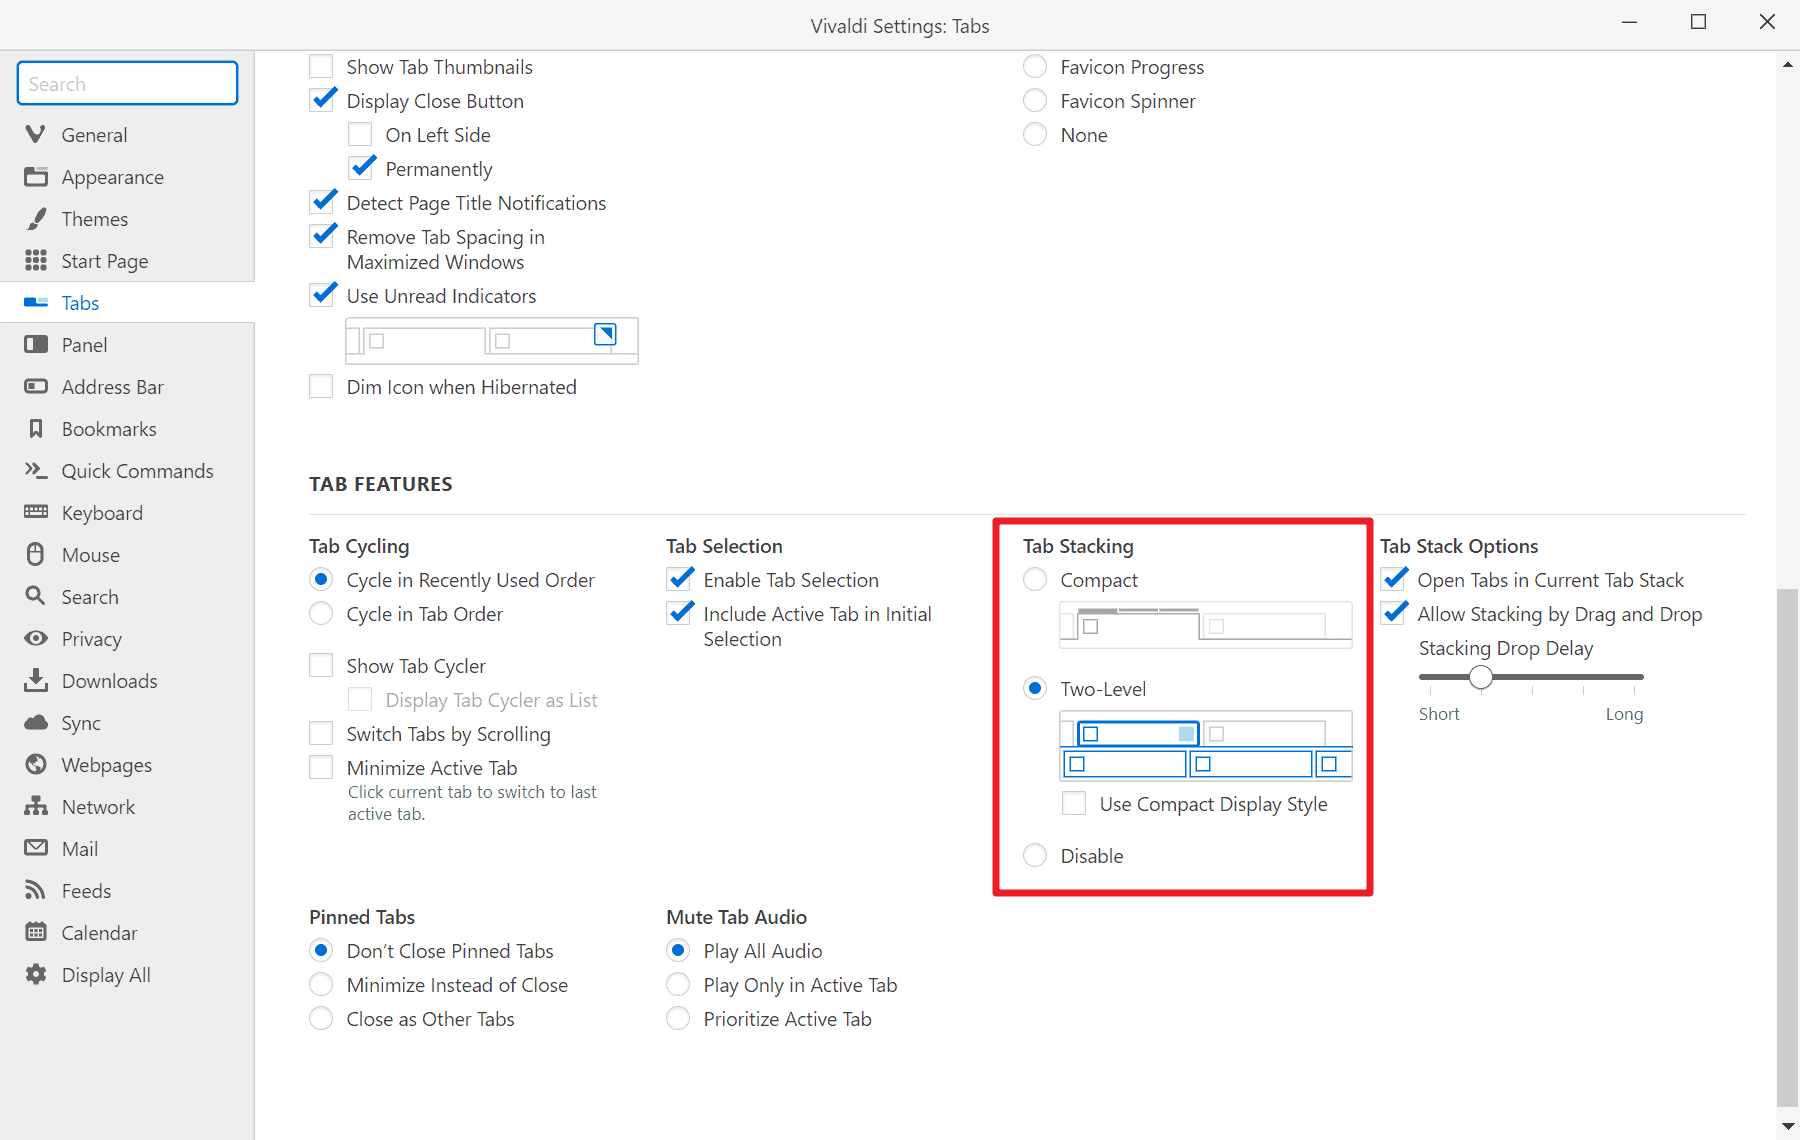 vivaldi tab stacking settings